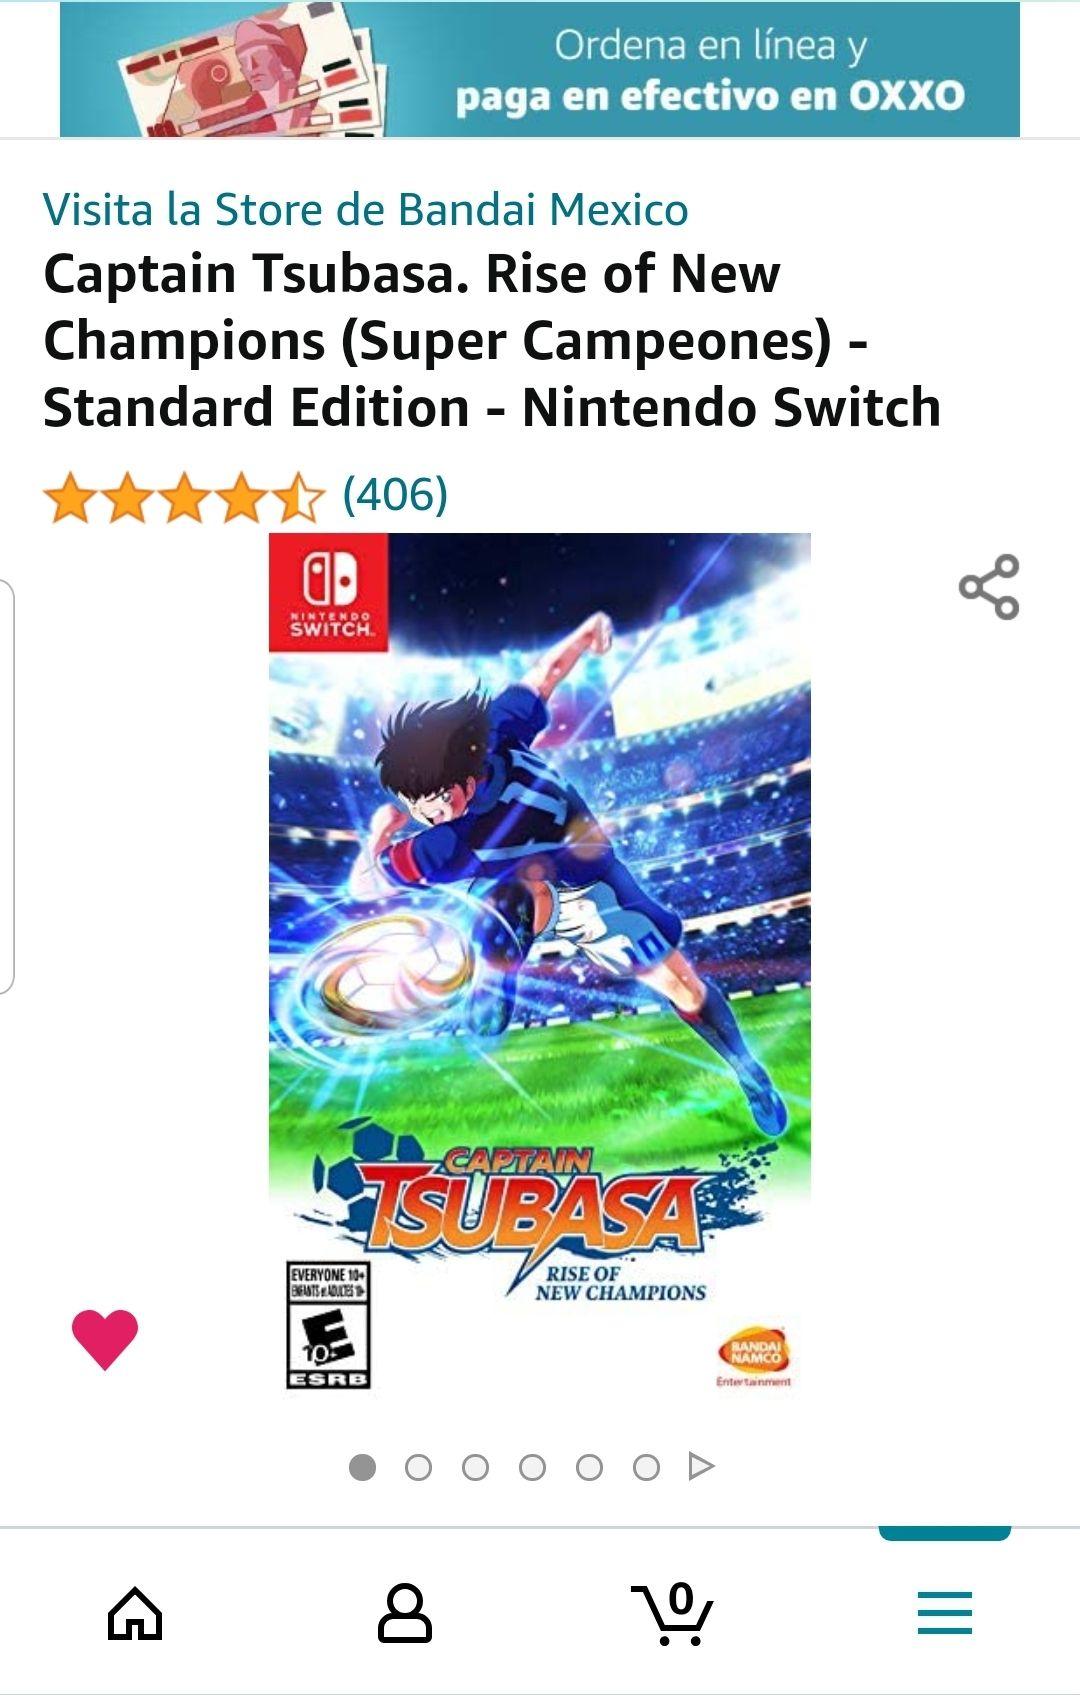 Amazon: Captain Tsubasa. Rise of New Champions (Super Campeones) - Standard Edition - Nintendo Switch